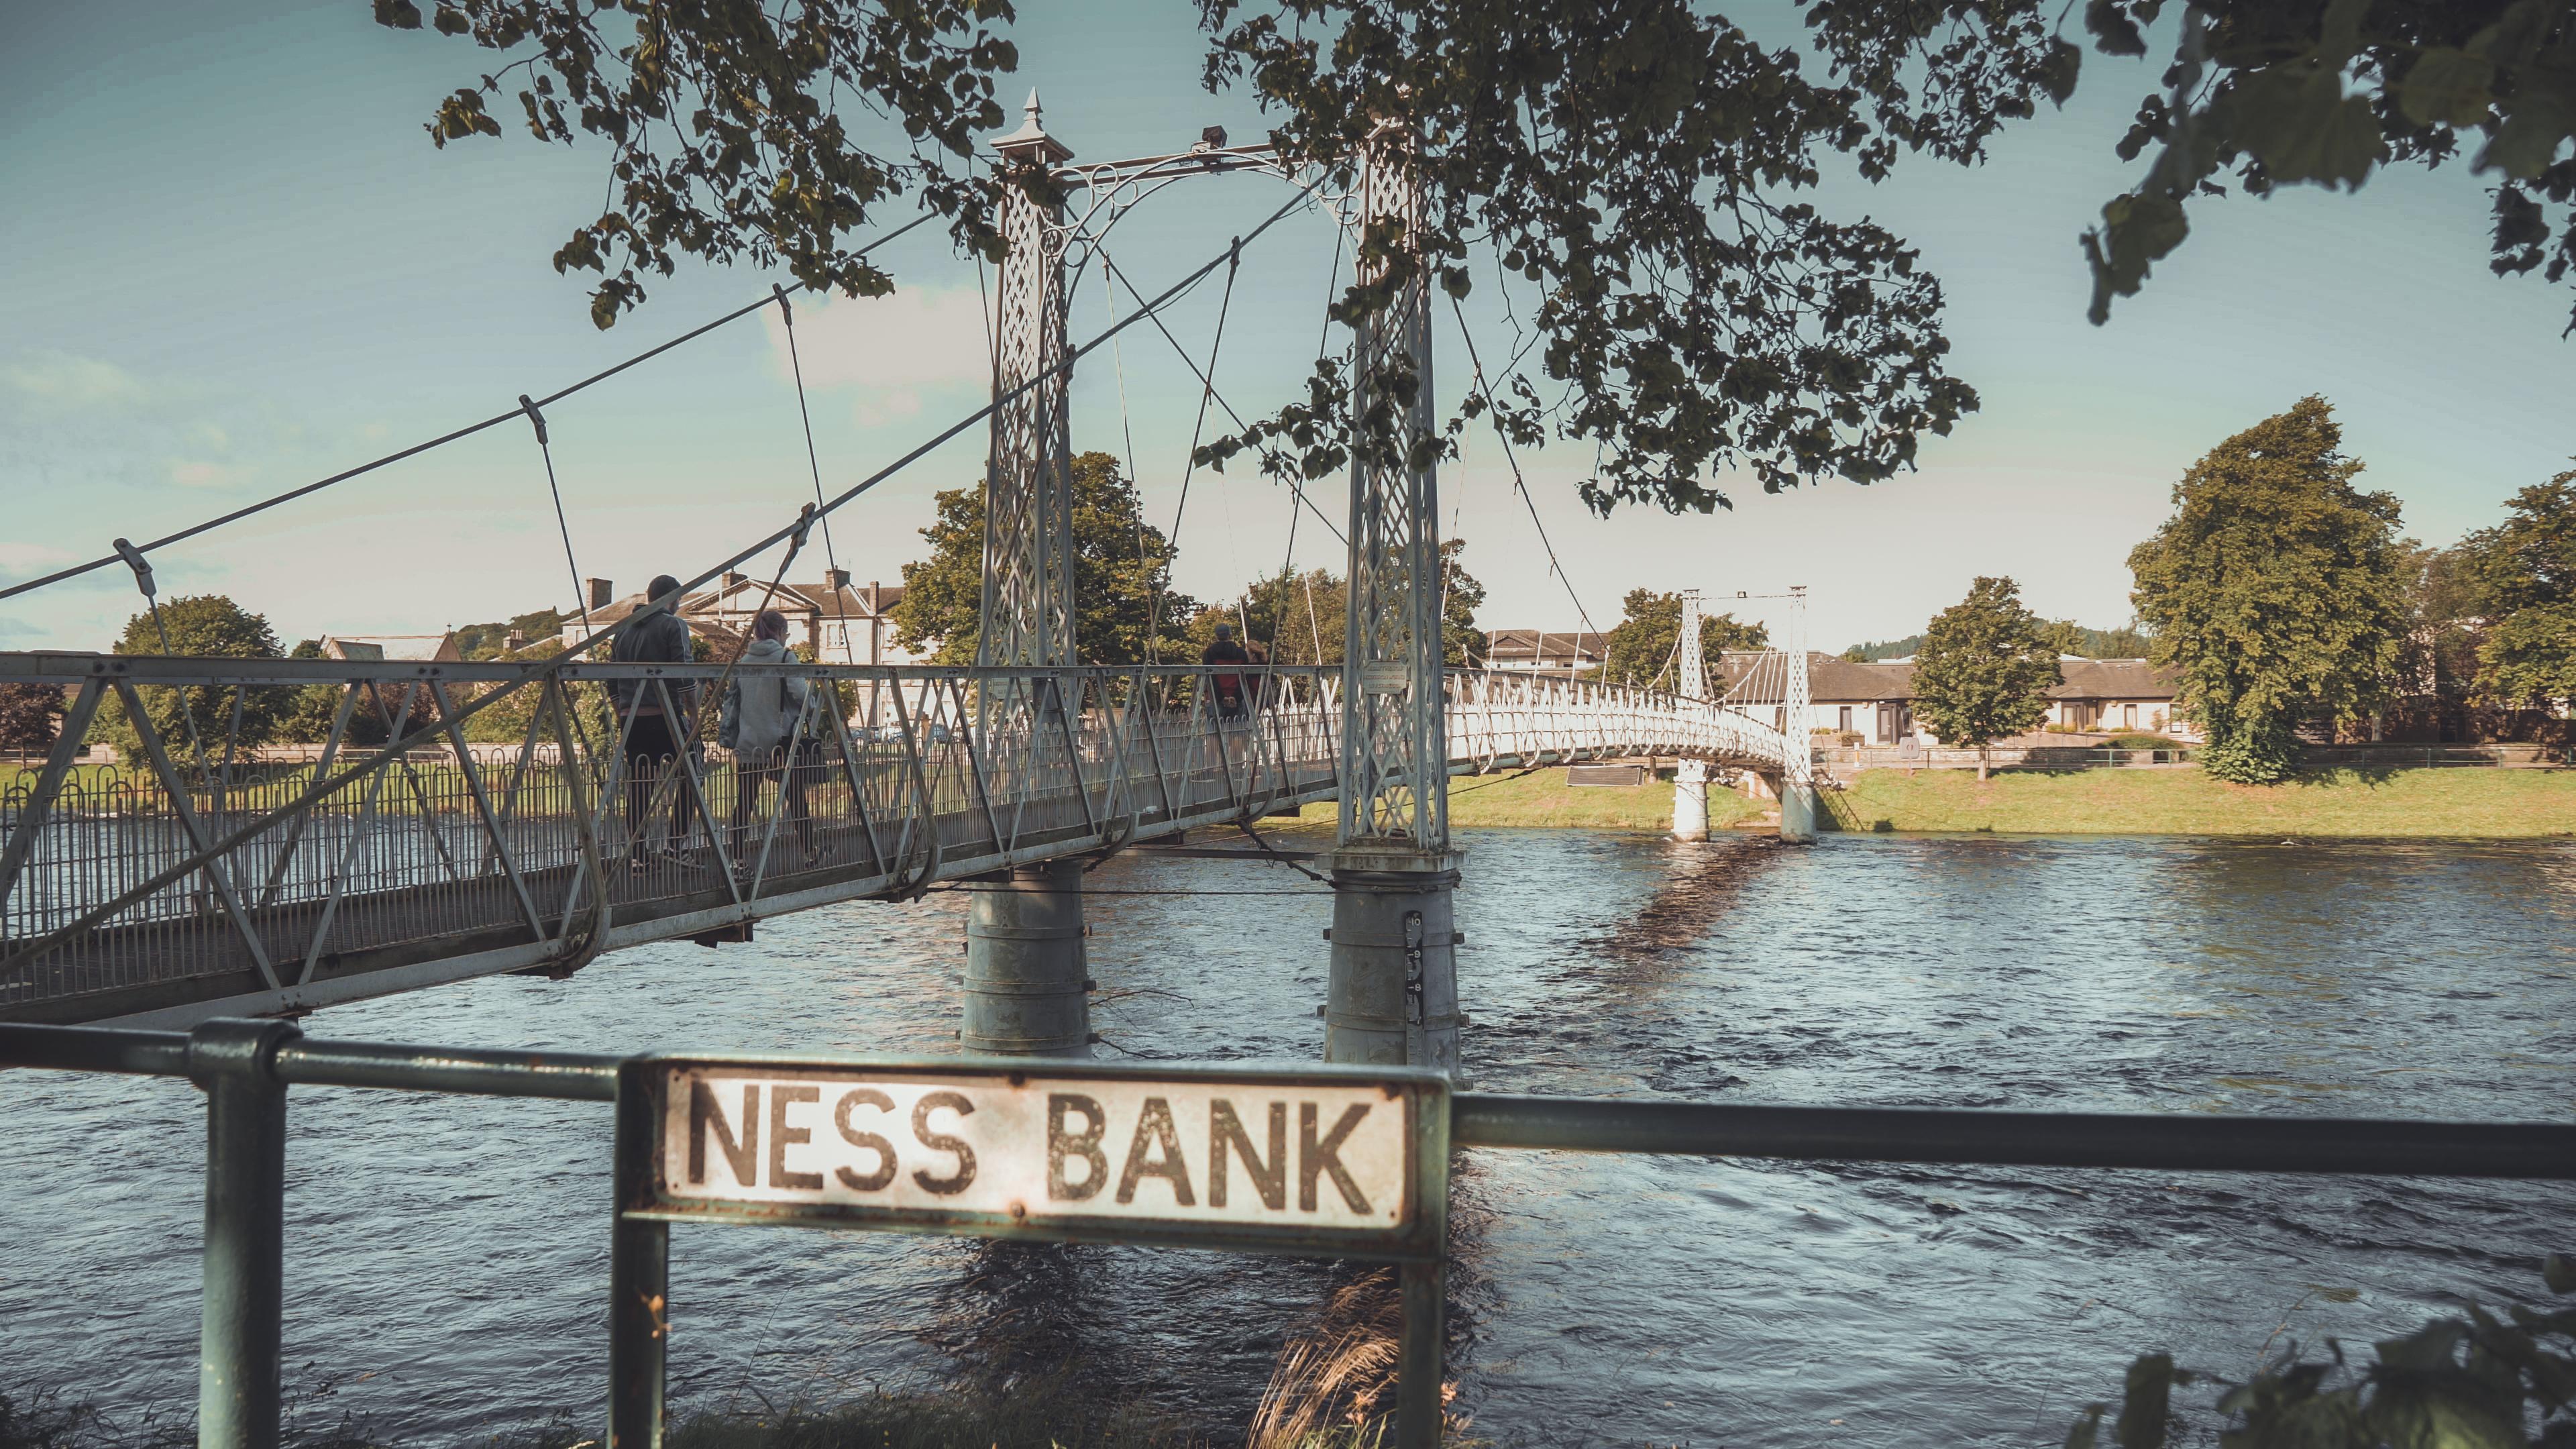 Ness Bank